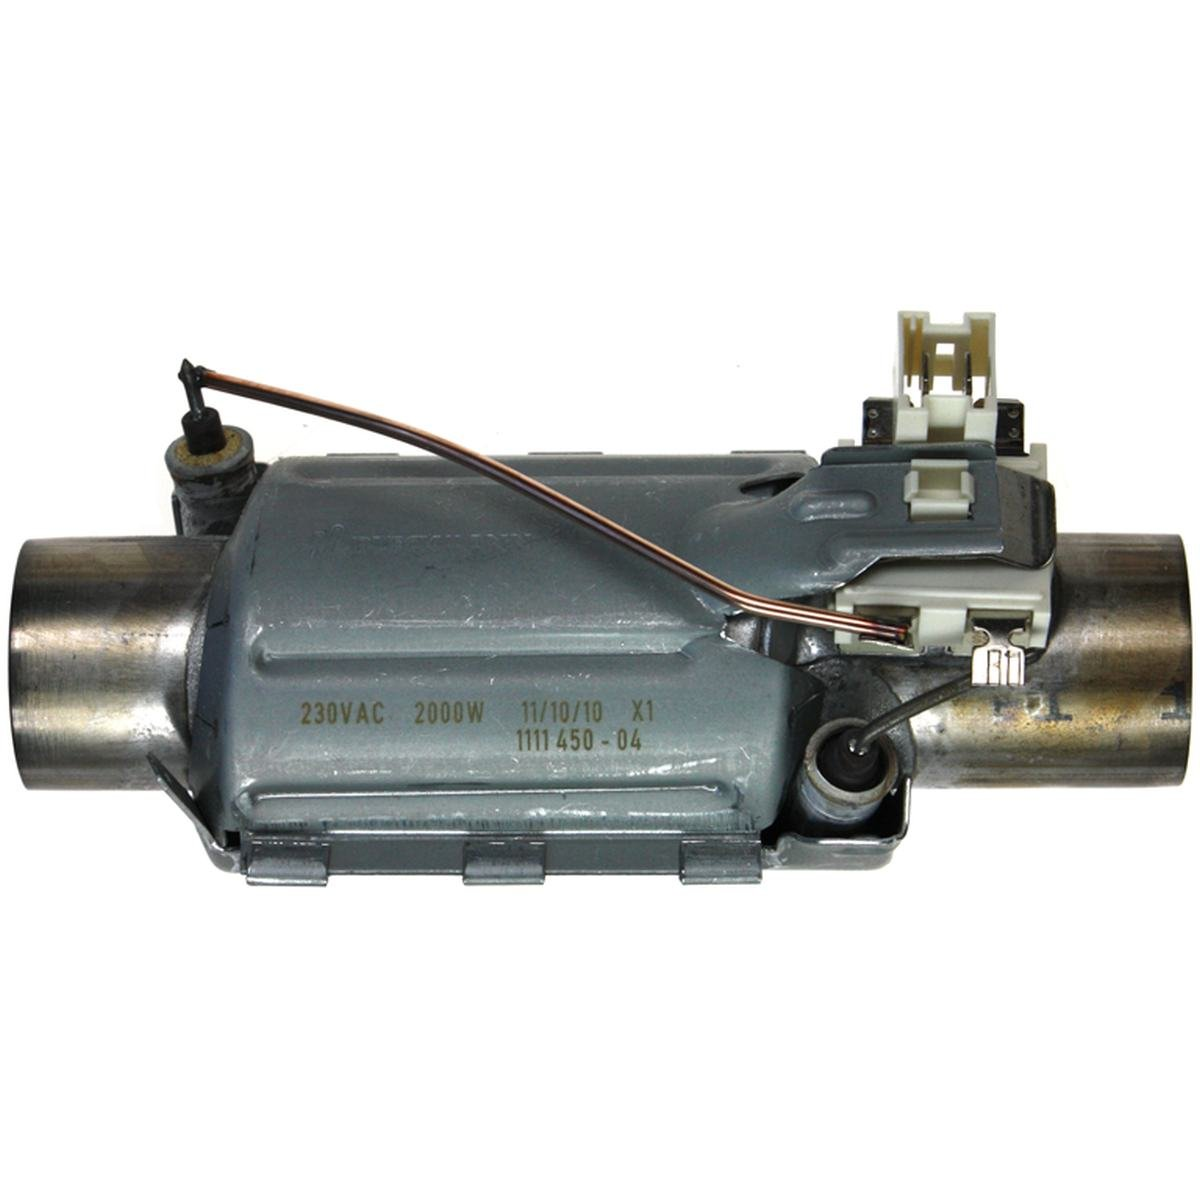 Varmelegeme 2000W 230V